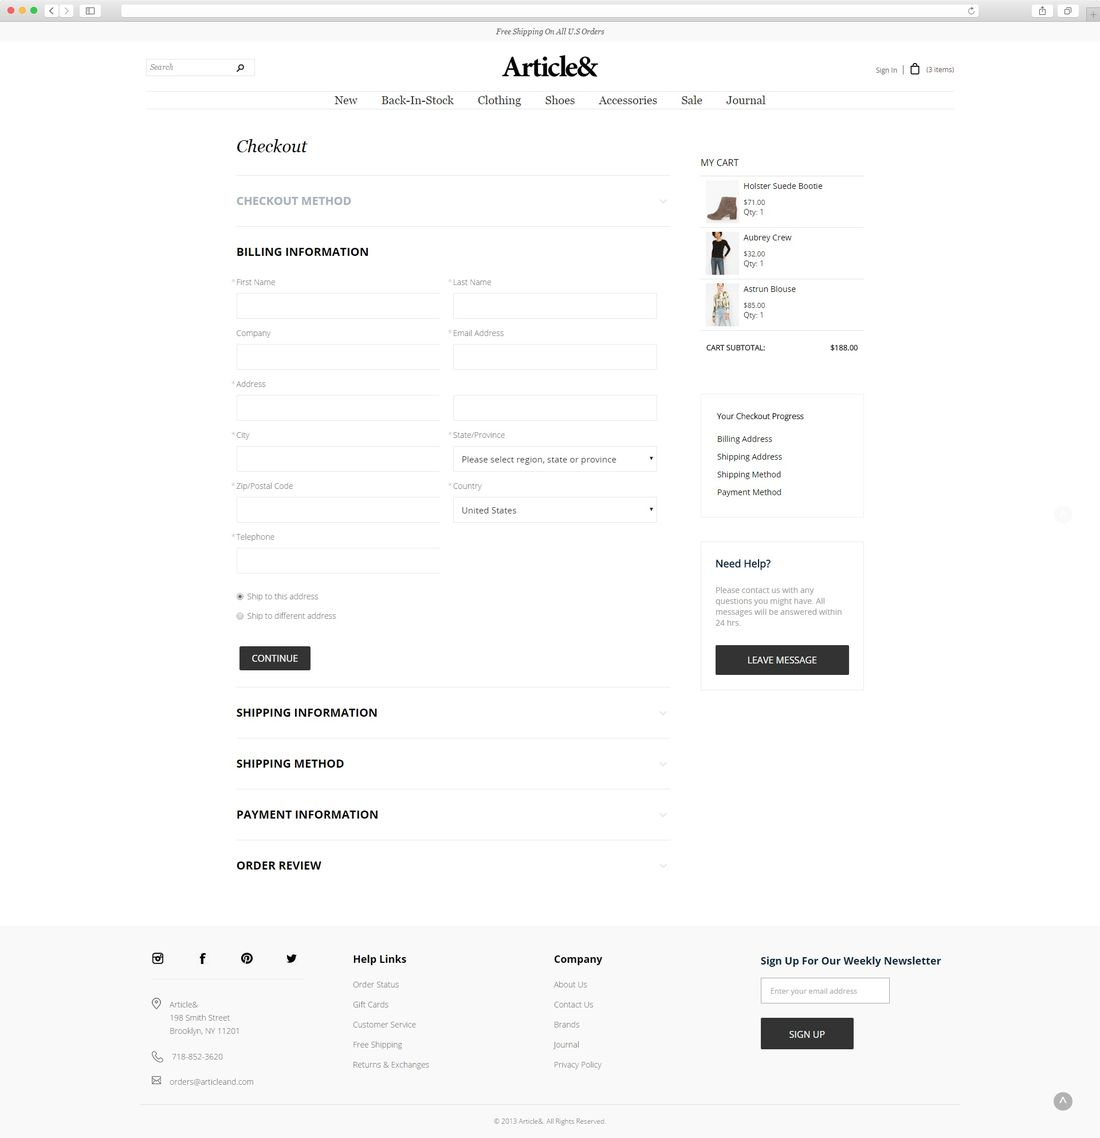 article_checkout